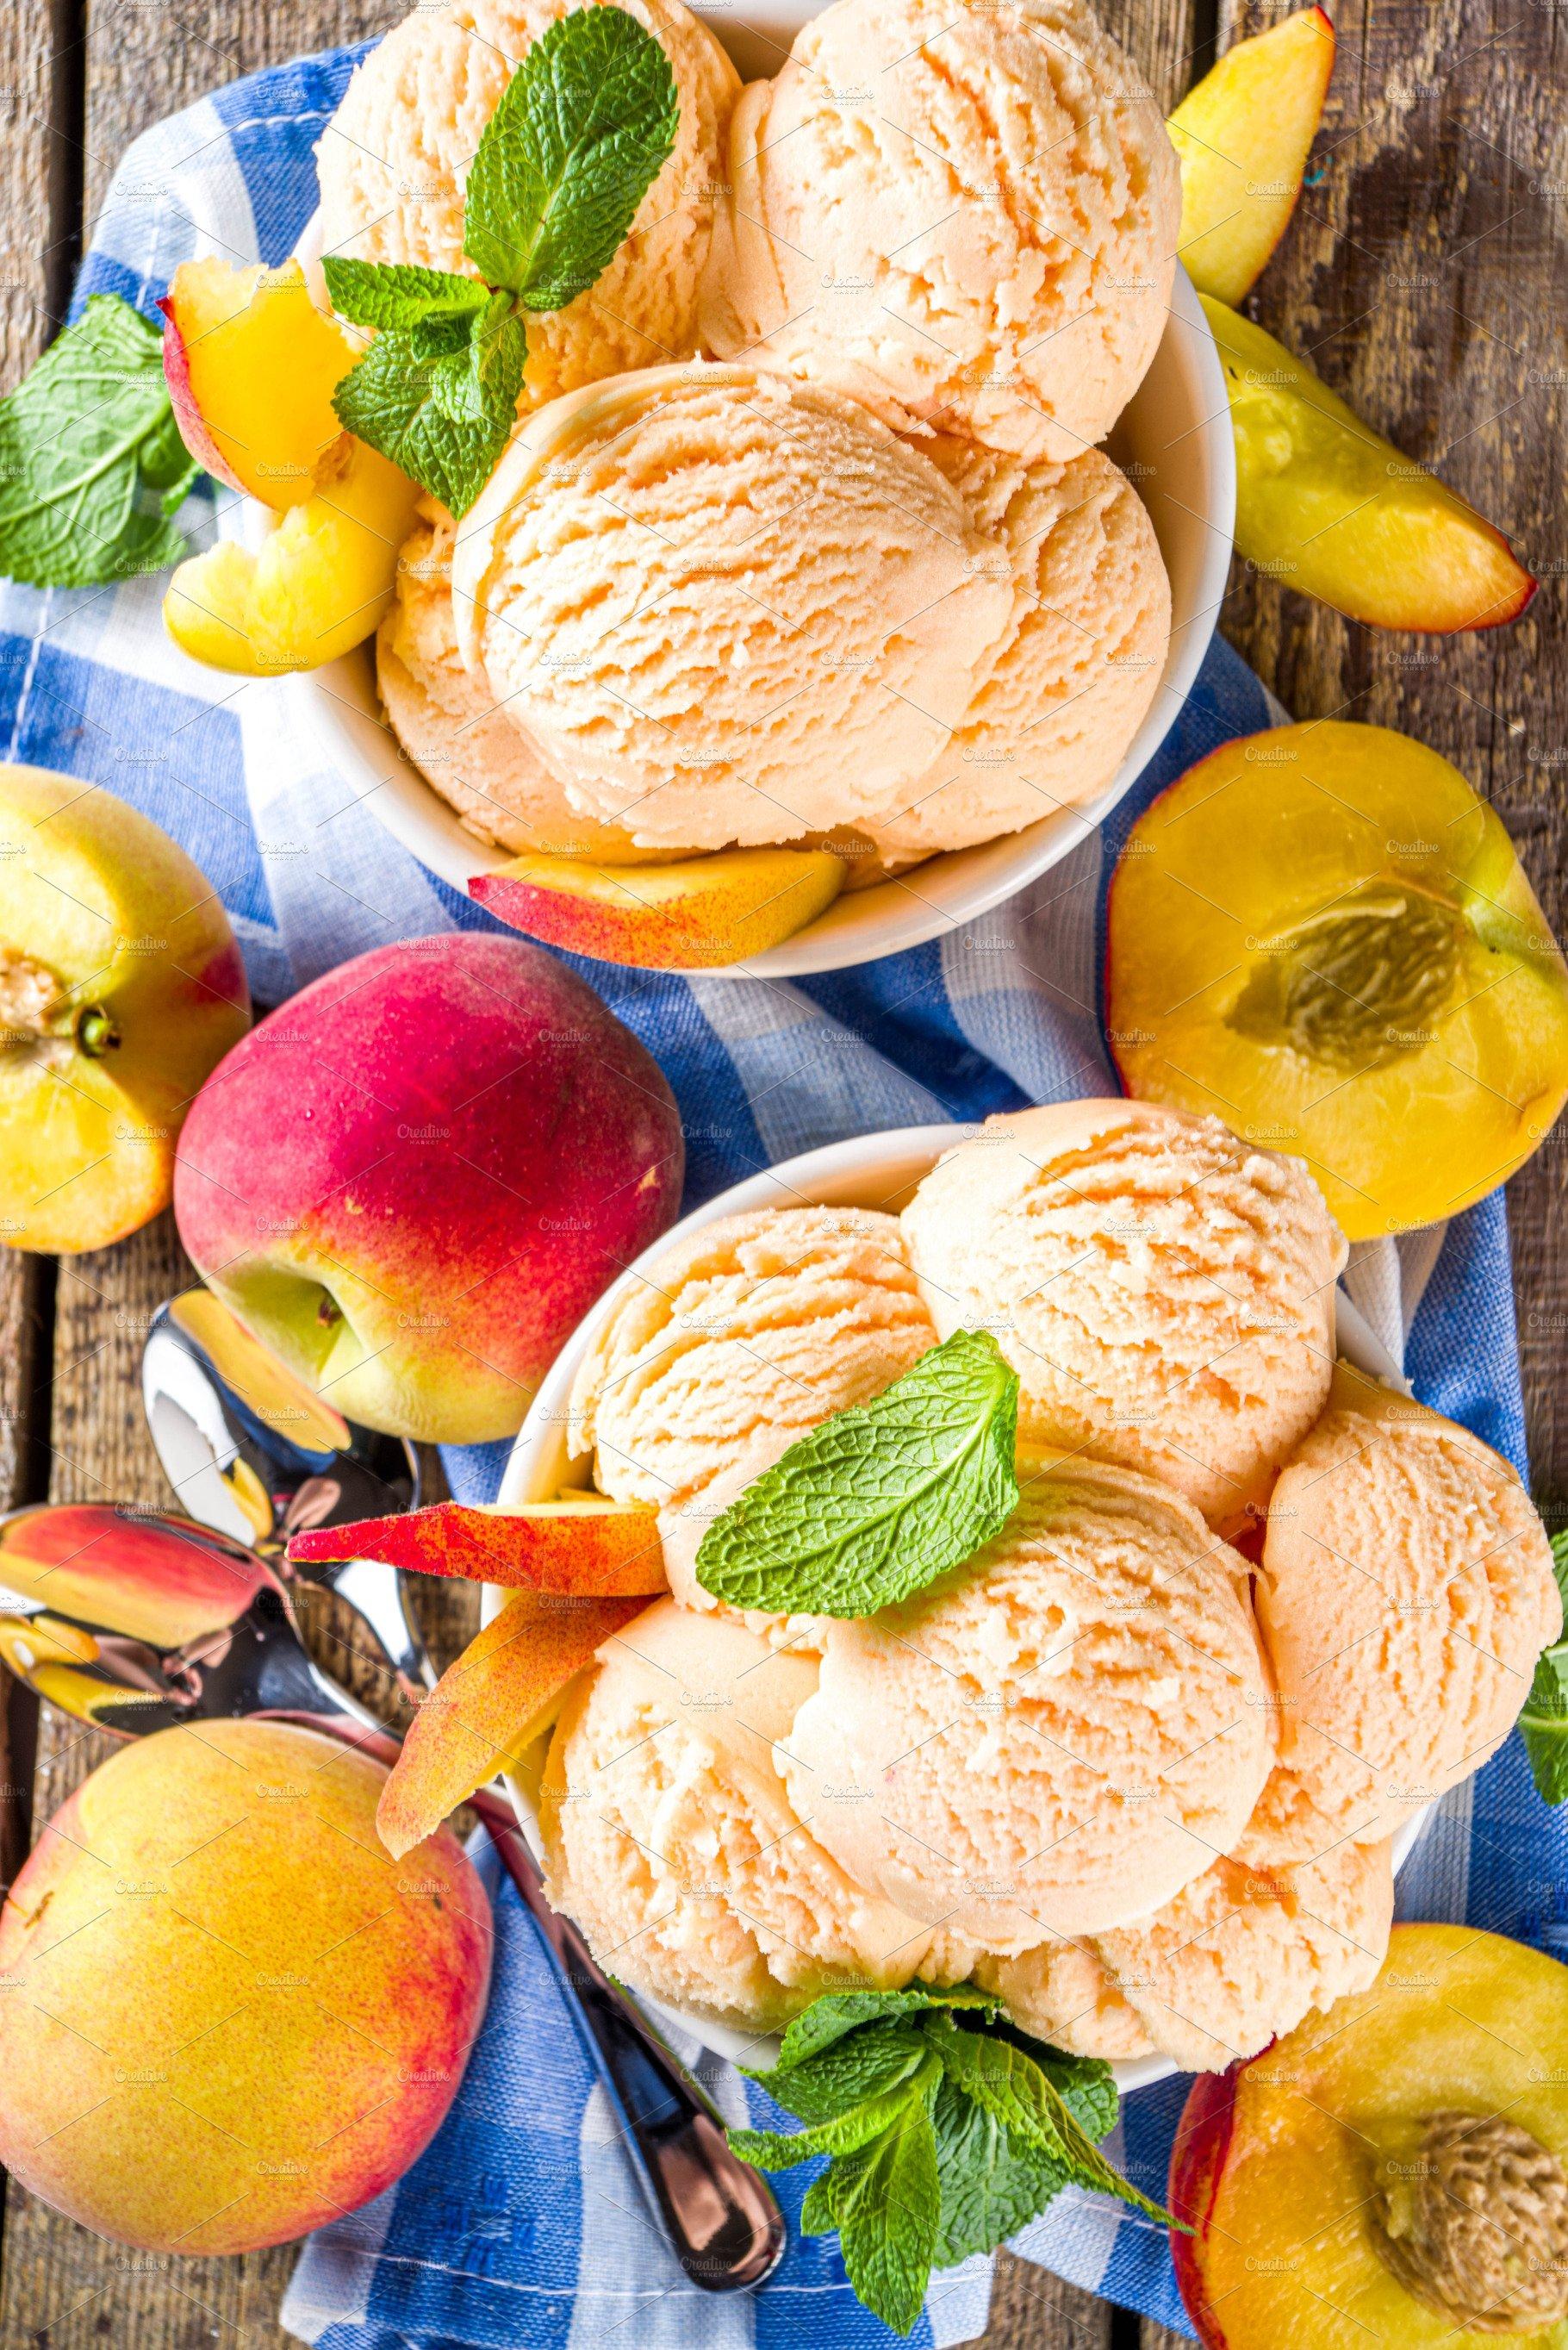 Peach Ice Cream High Quality Stock Photos Creative Market